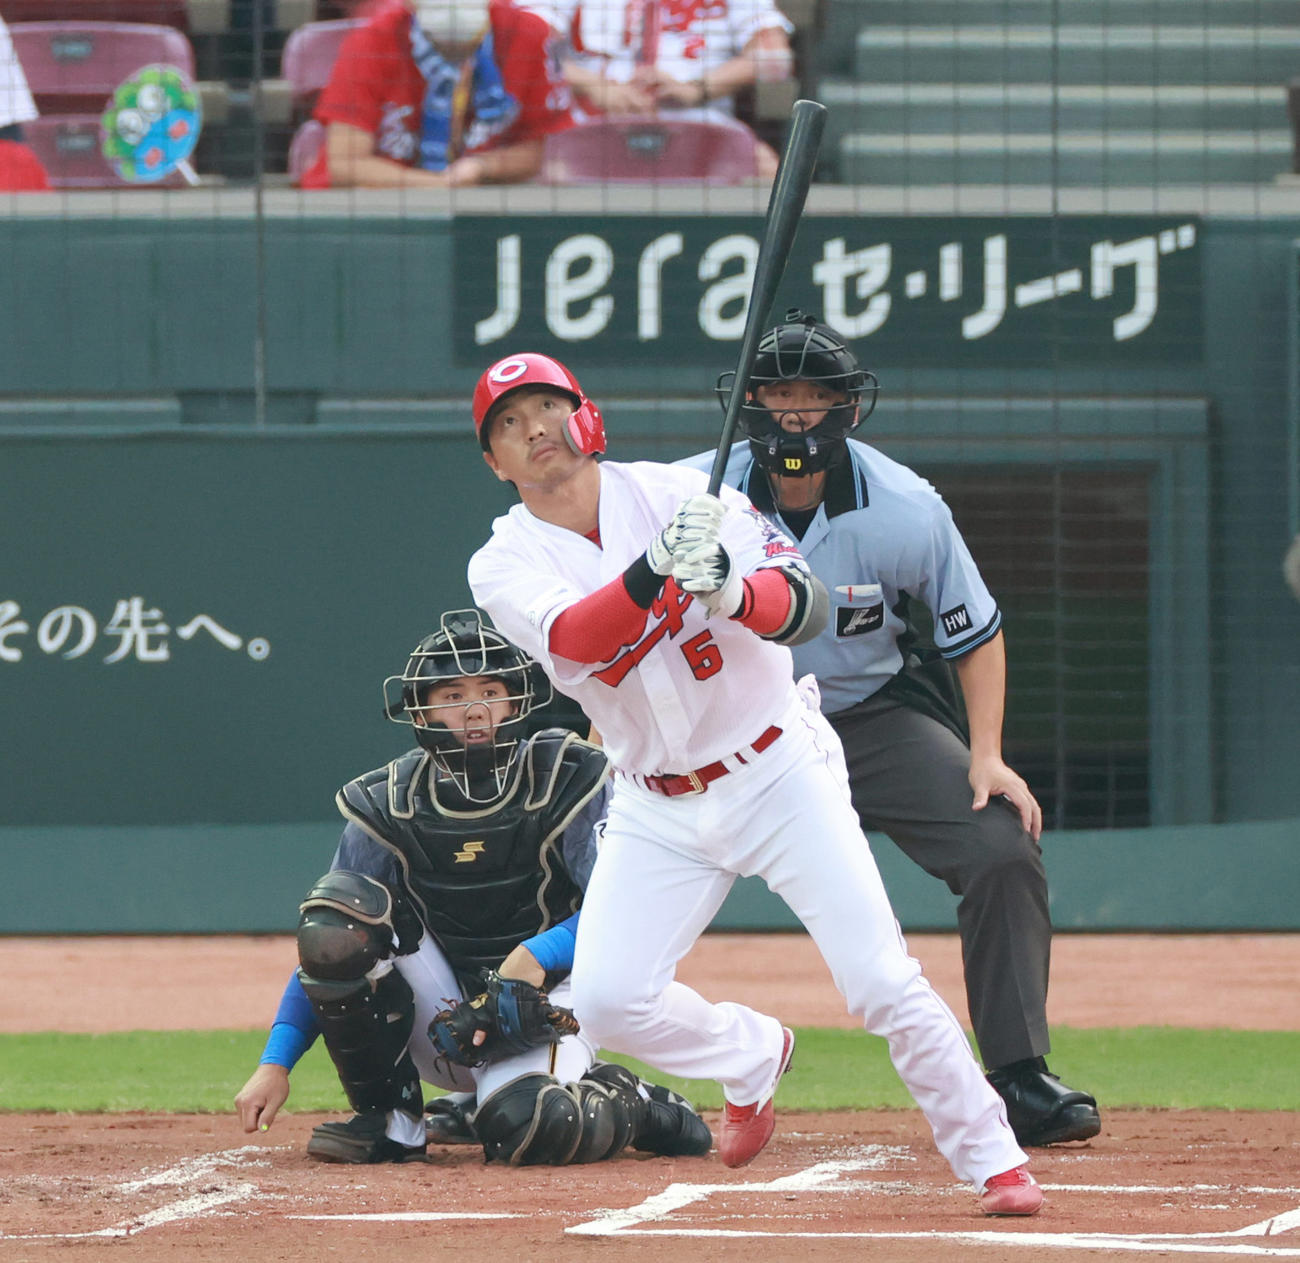 広島対阪神 1回裏広島2死、左中間へ先制本塁打を放つ長野(撮影・清水貴仁)